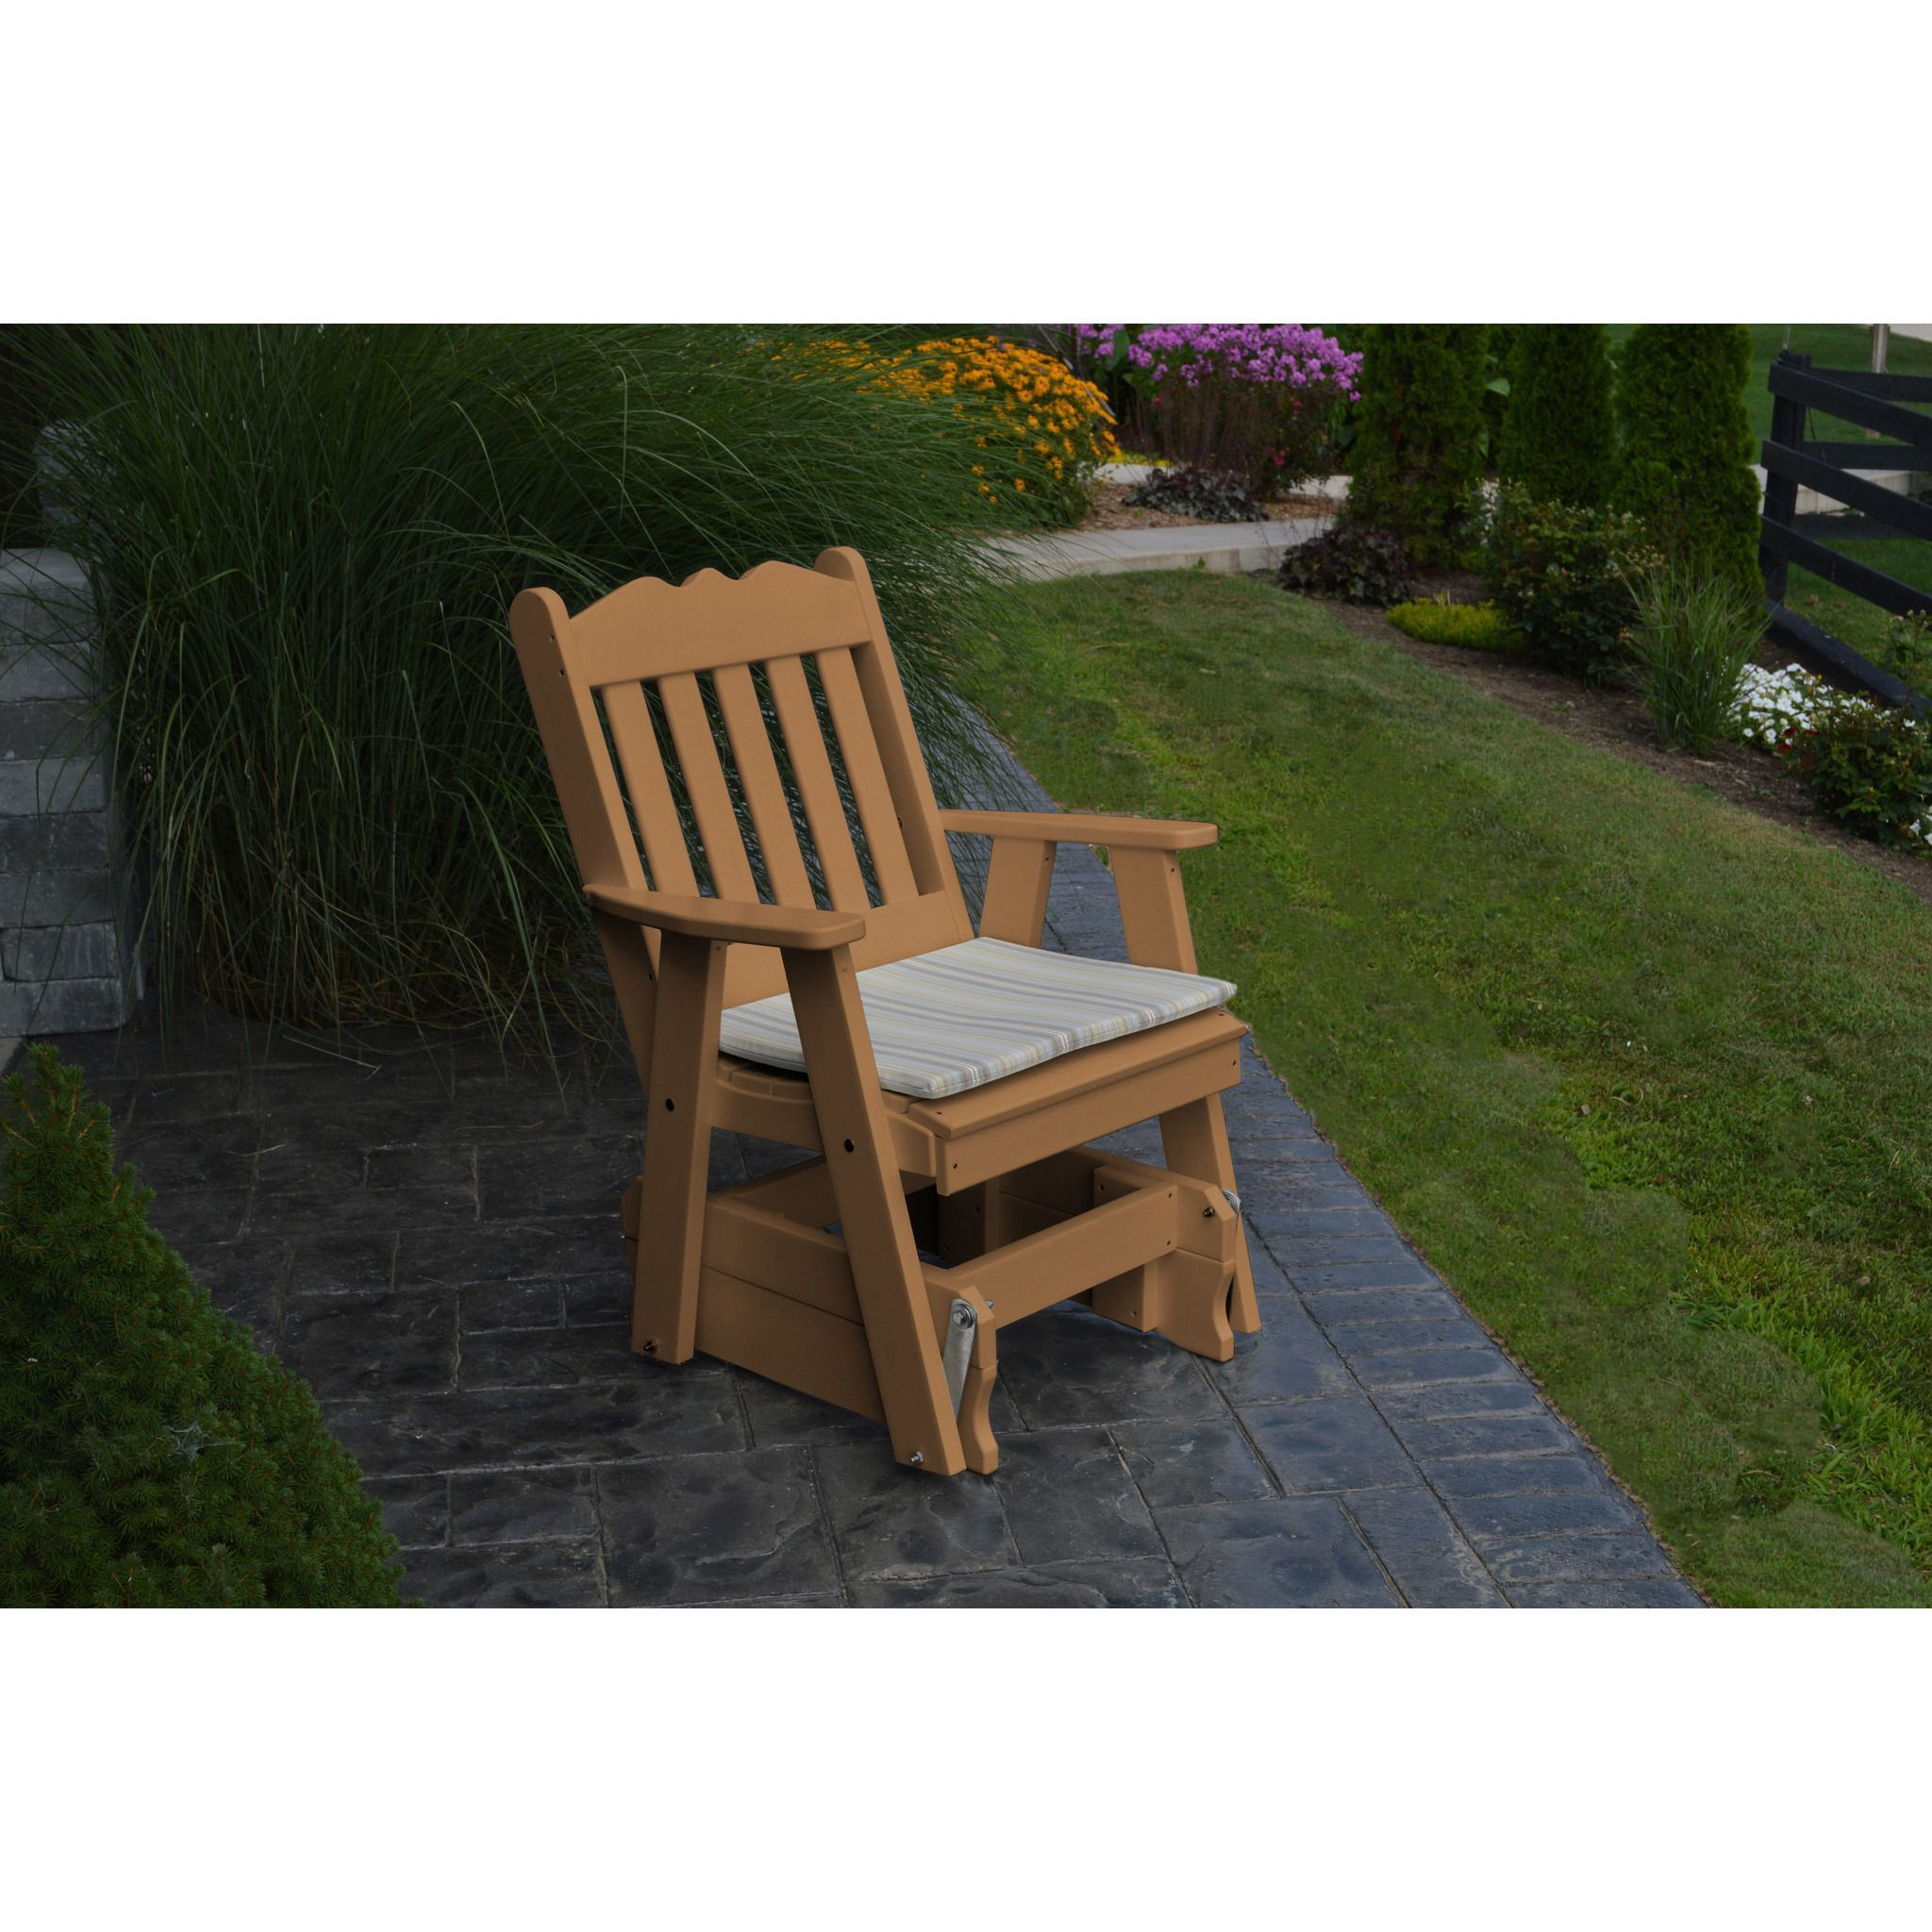 Au0026L Furniture Company Recycled Plastic Royal English Gliding Chair